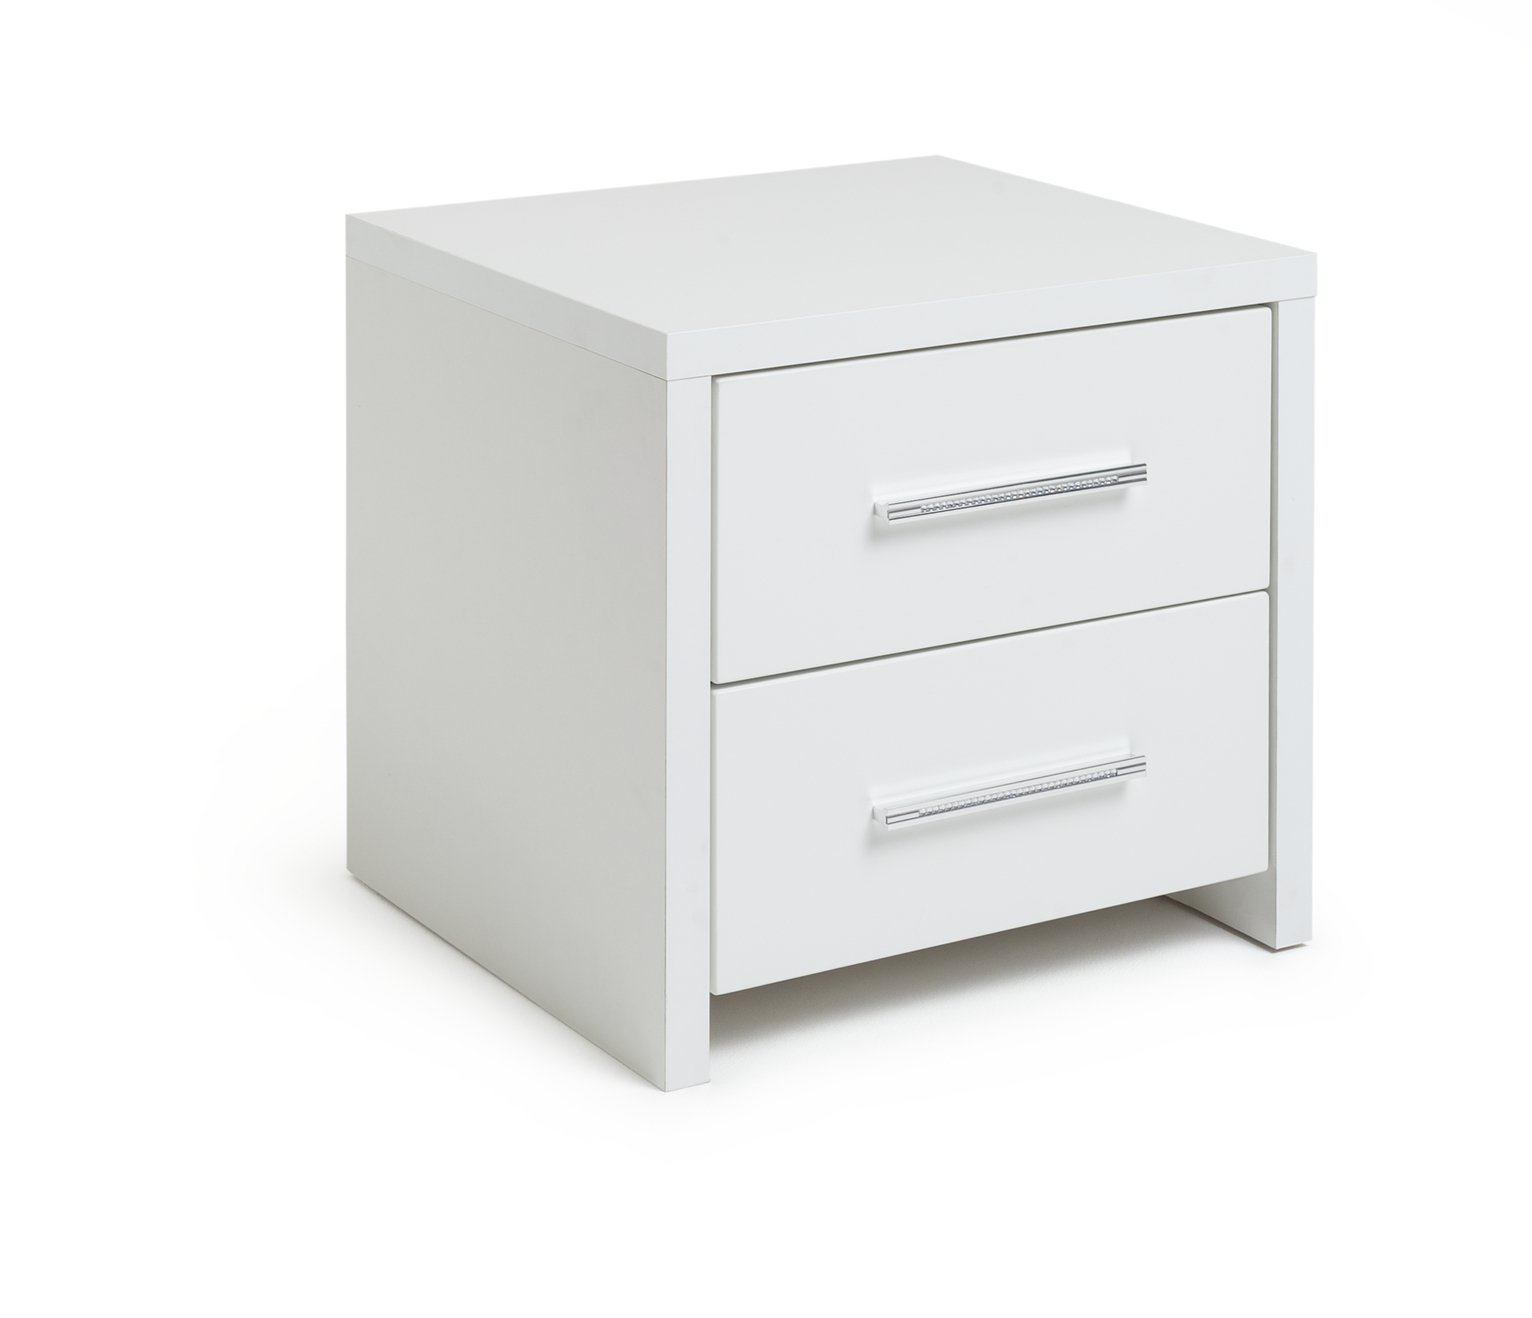 Argos Home Broadway 2Drw Bedside Chest - White Gloss & White